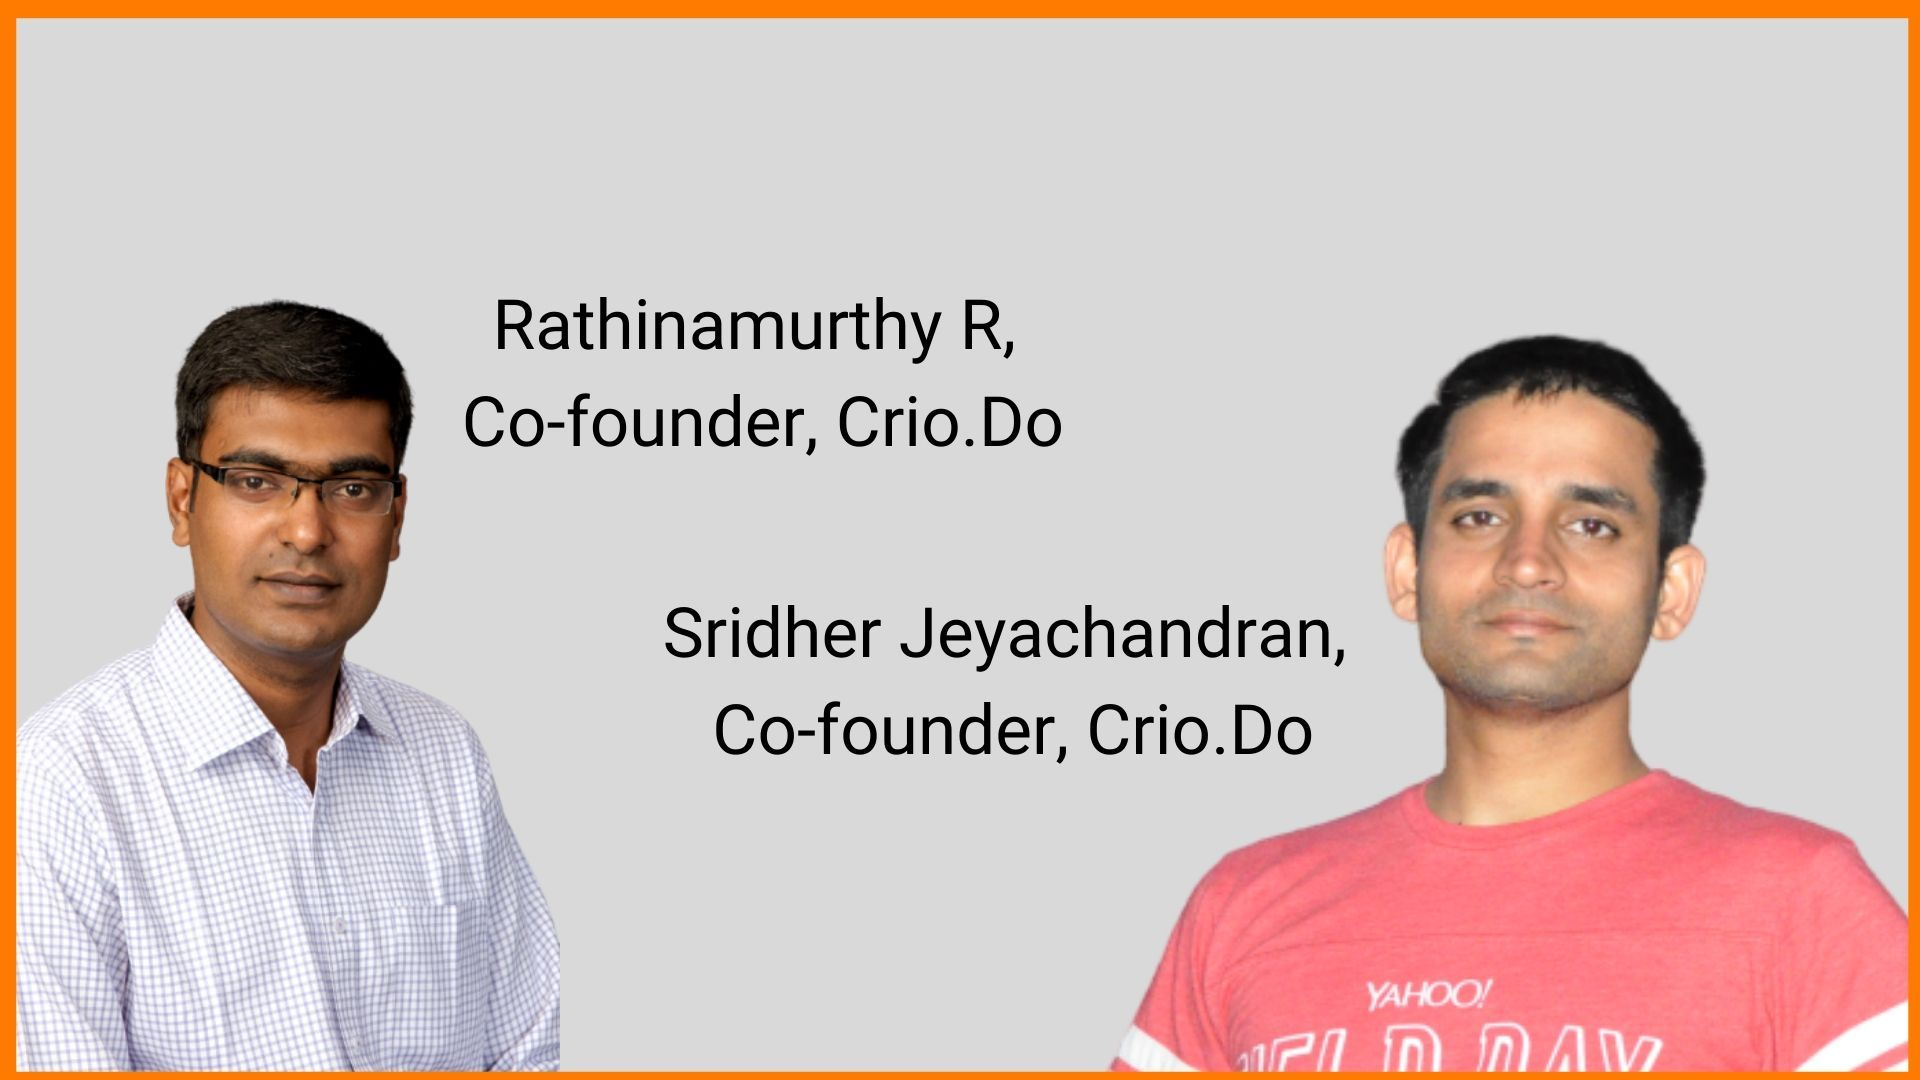 Founders of Crio.Do